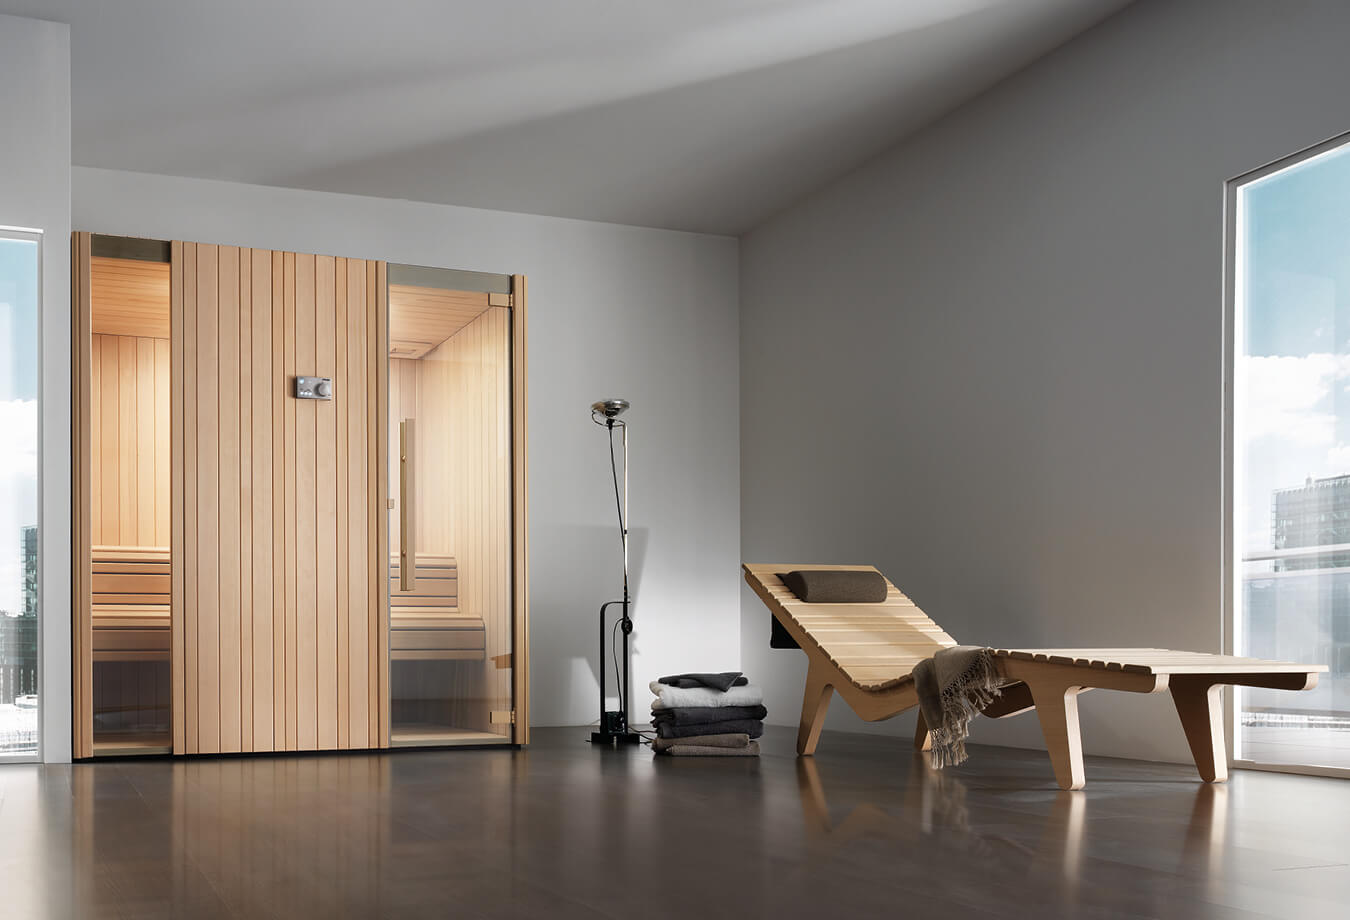 Sauna finlandais Aquilus Spas gamme Aukiline